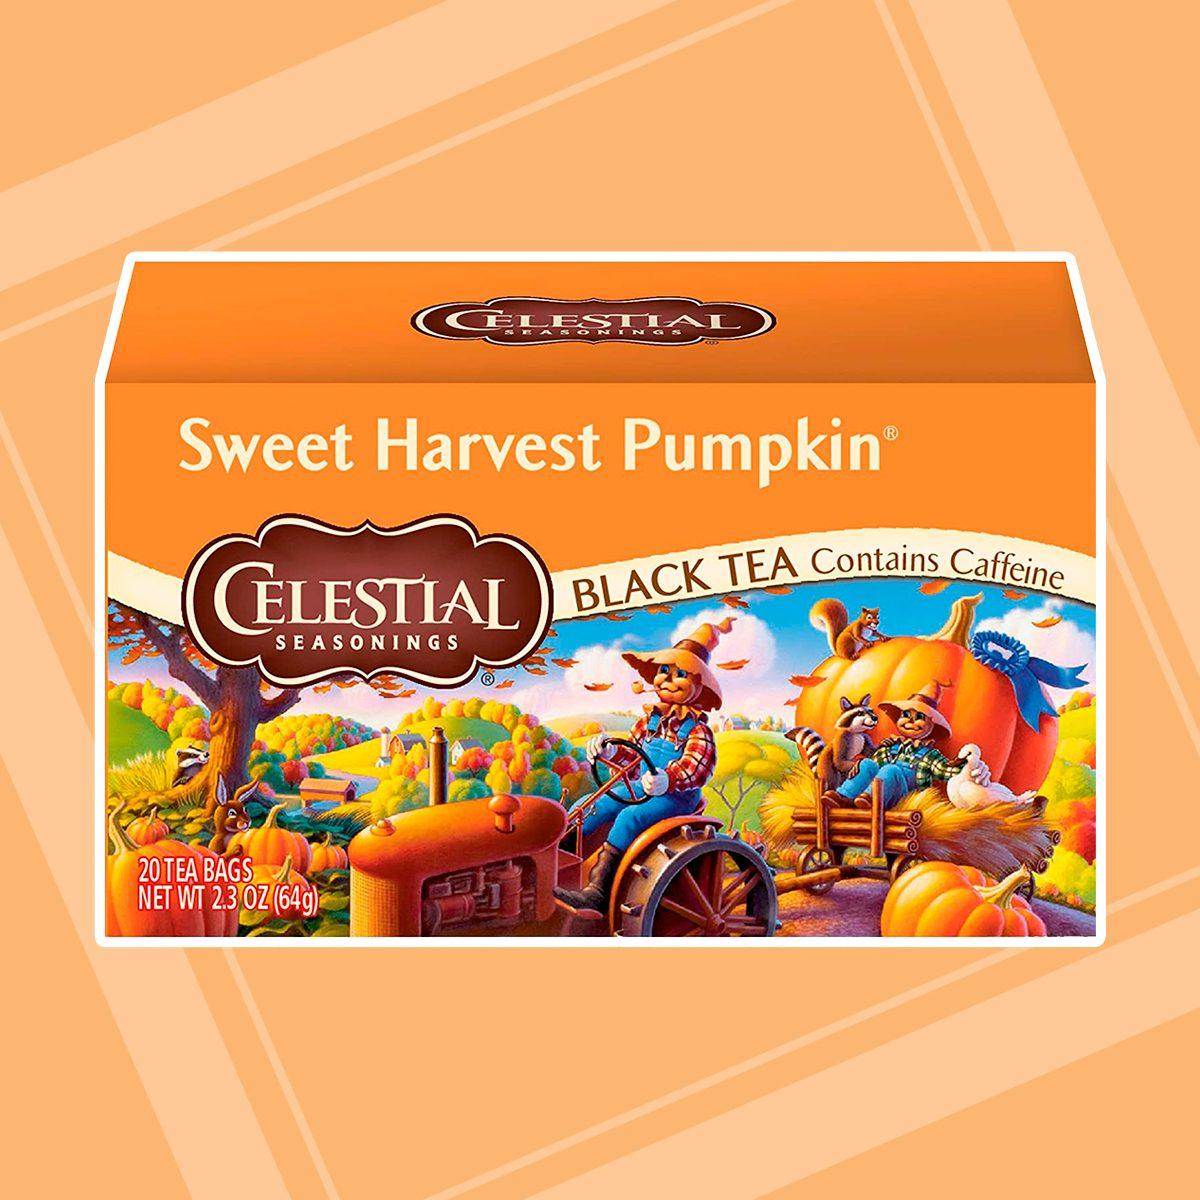 CELESTIAL SEASONINGS Sweet Harvest Pumpkin Tea, 20 CT